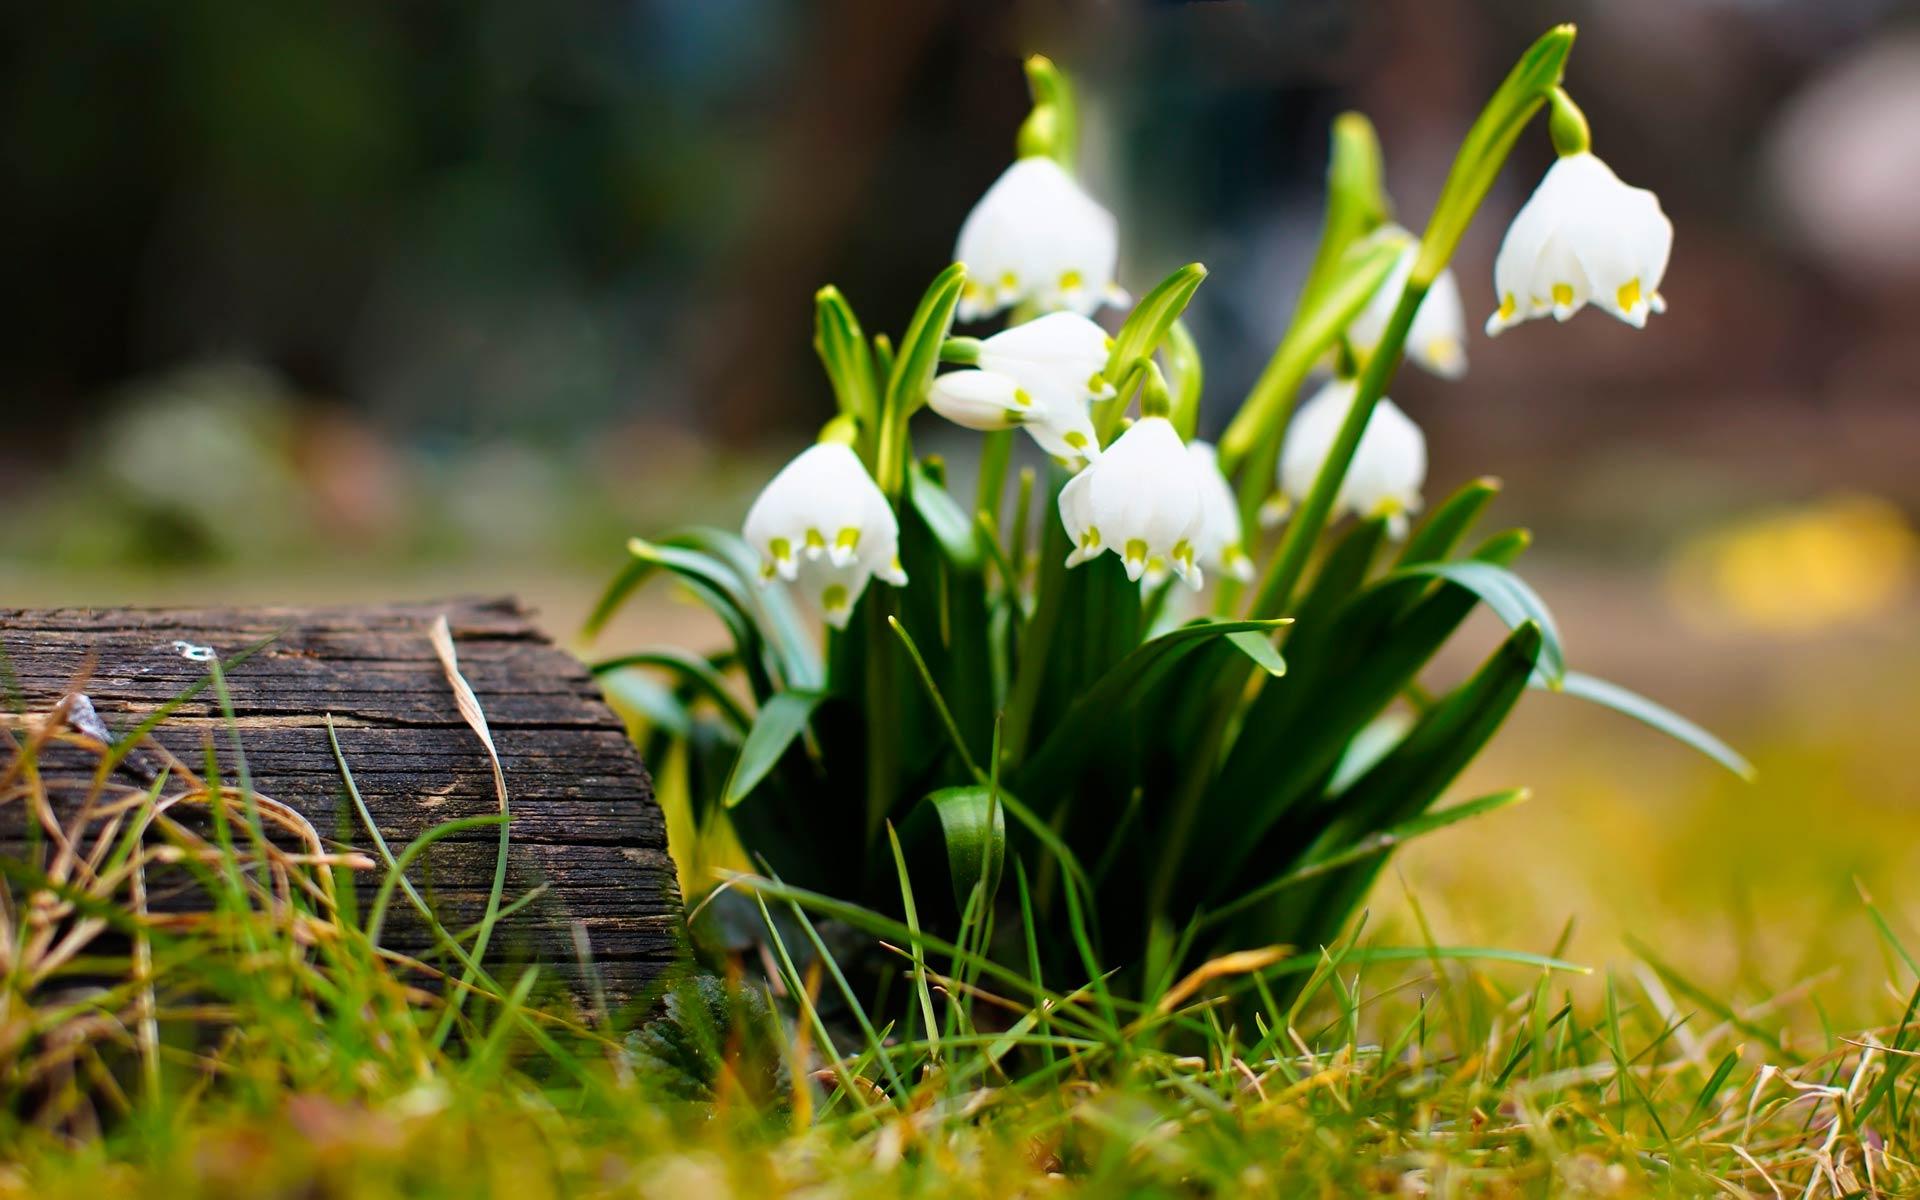 Стихи про весну  Самые красивые и нежные стихи про весну